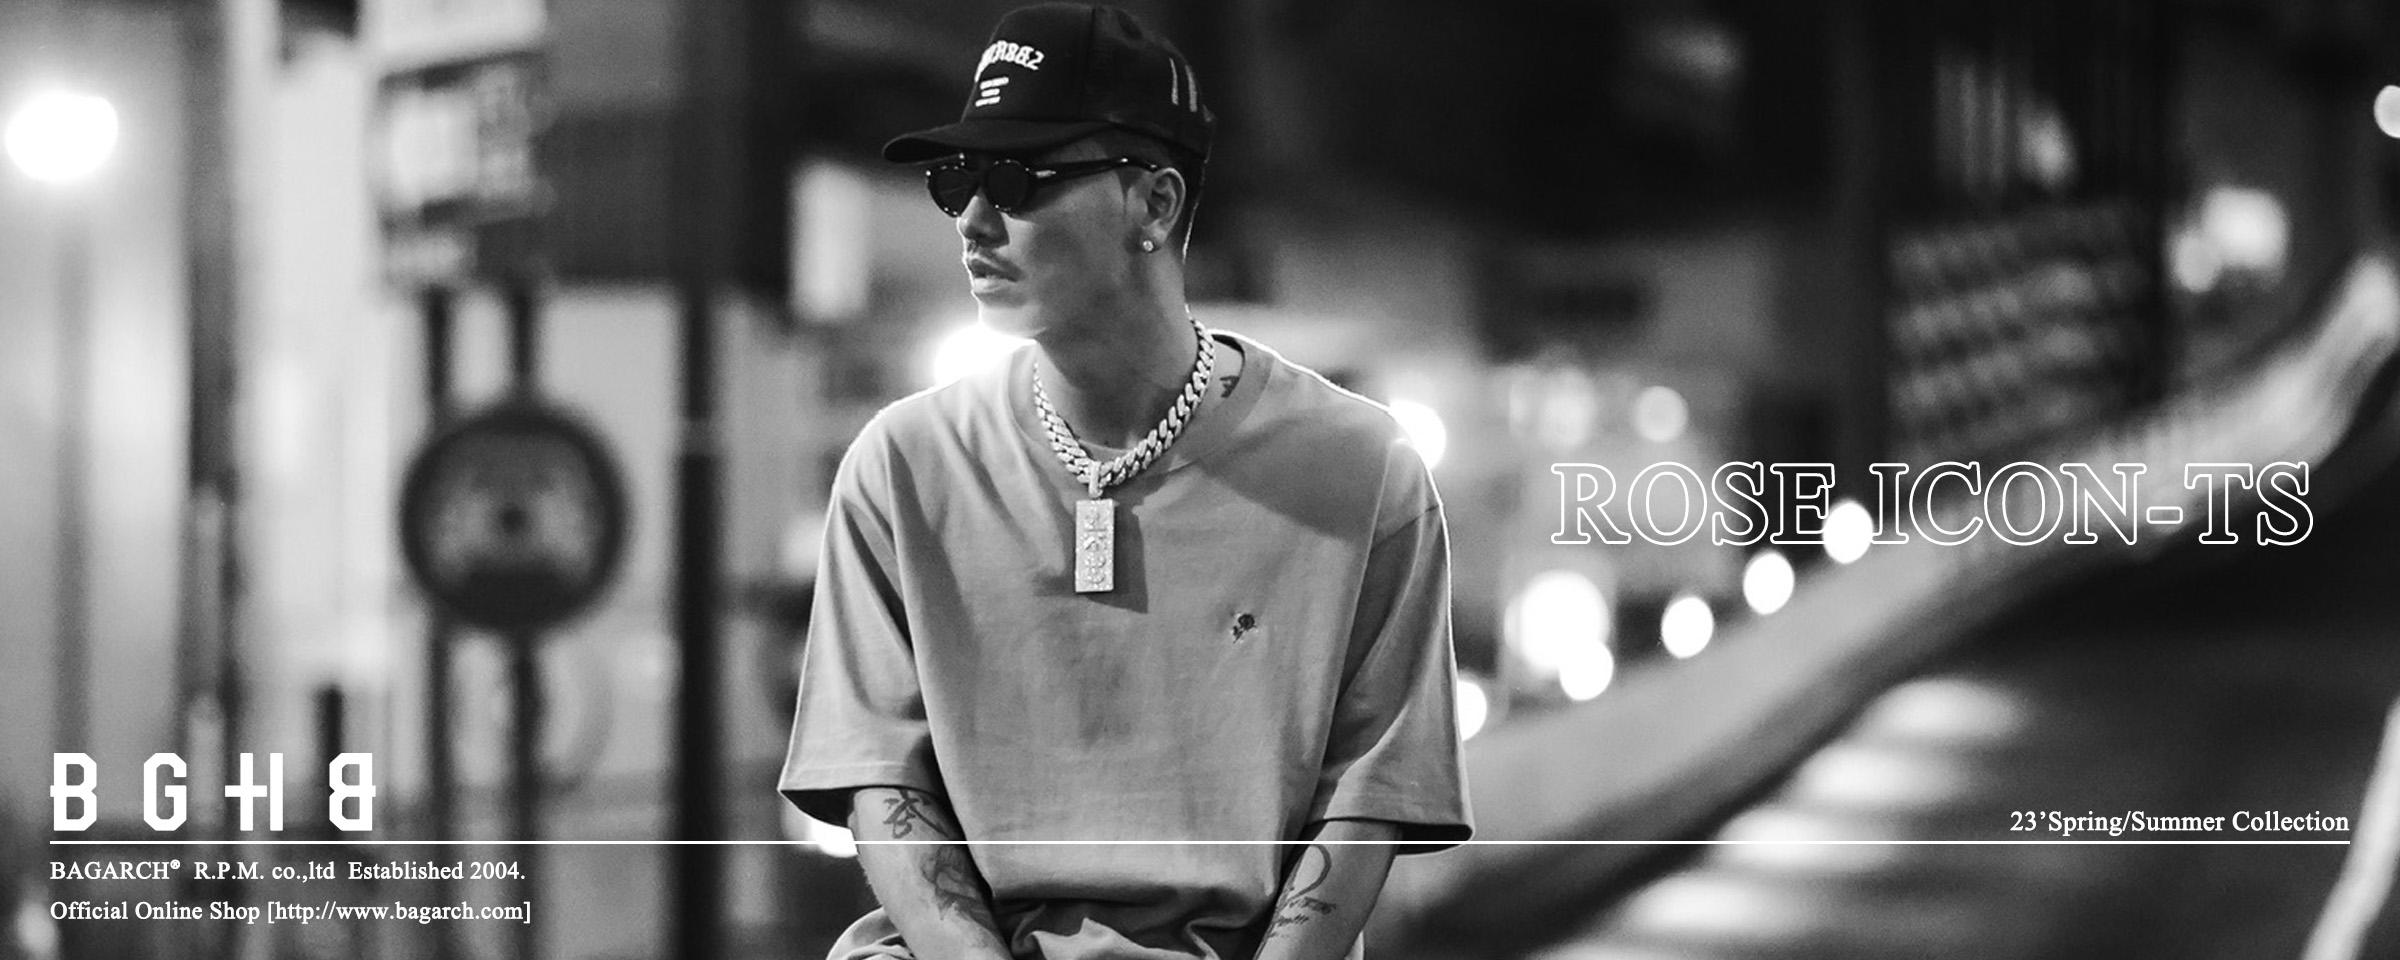 BGHB GANG-LTS